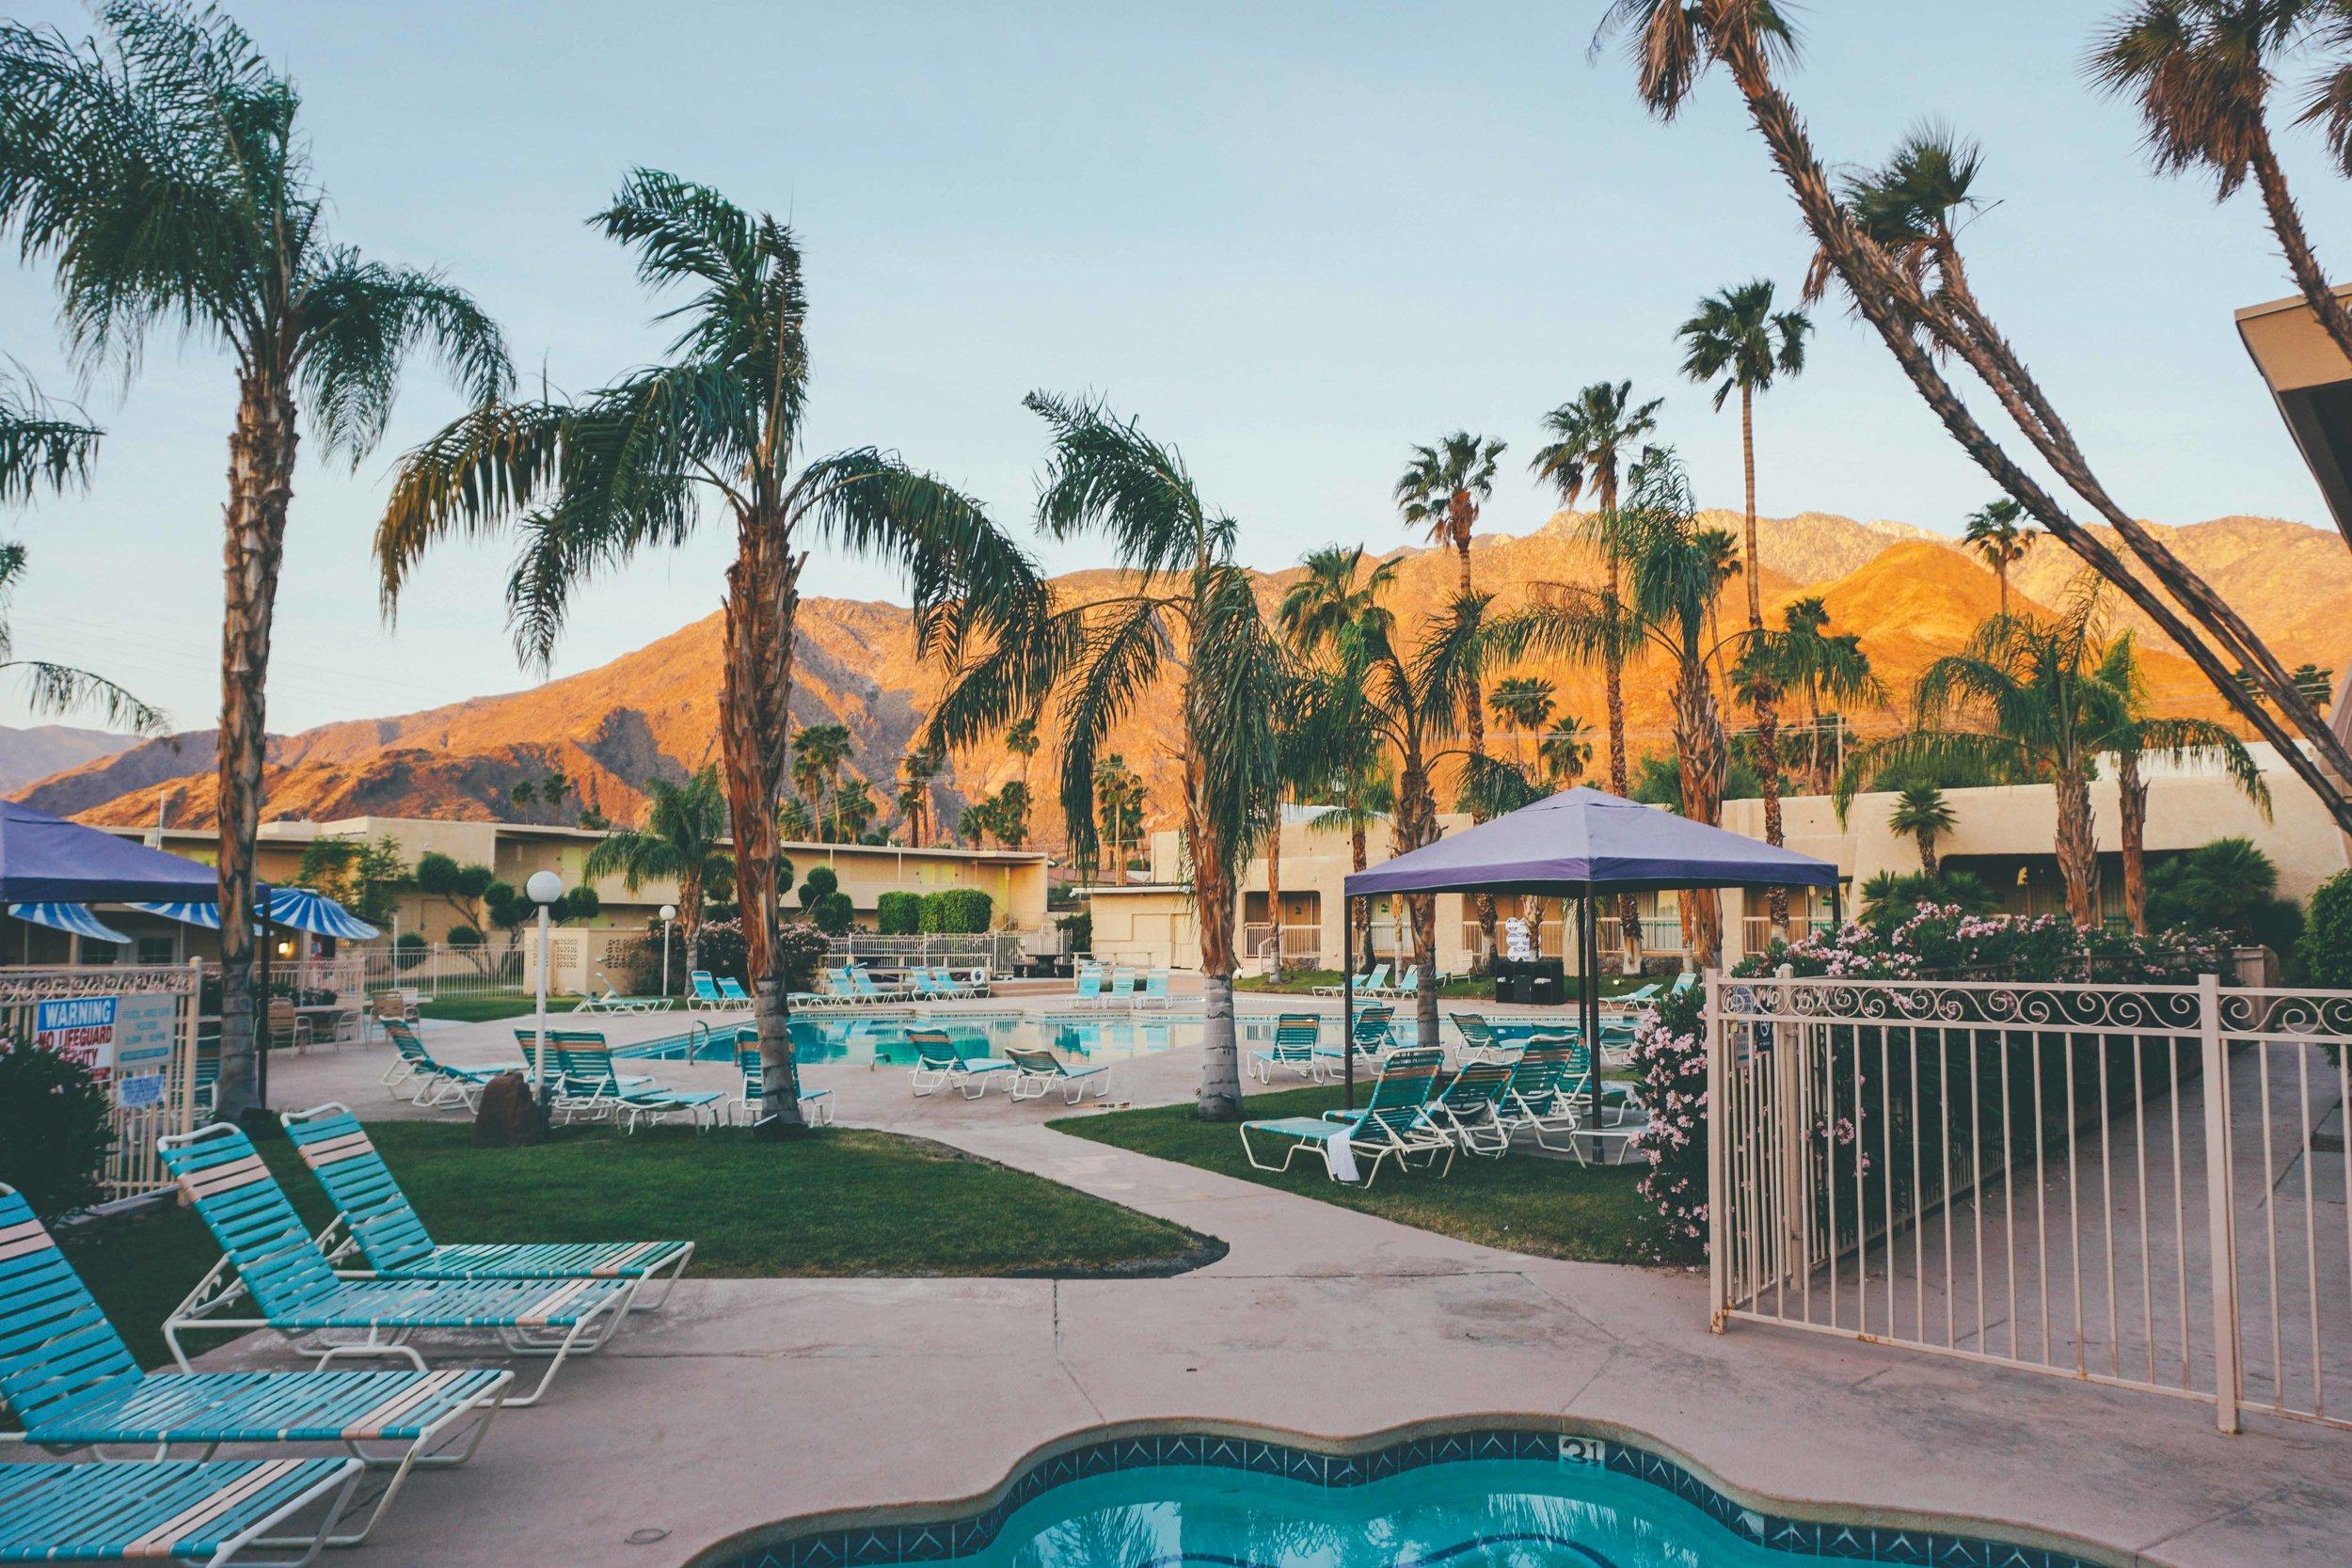 Days Inn Motel Palm Springs, Accommodation Coachella Festival